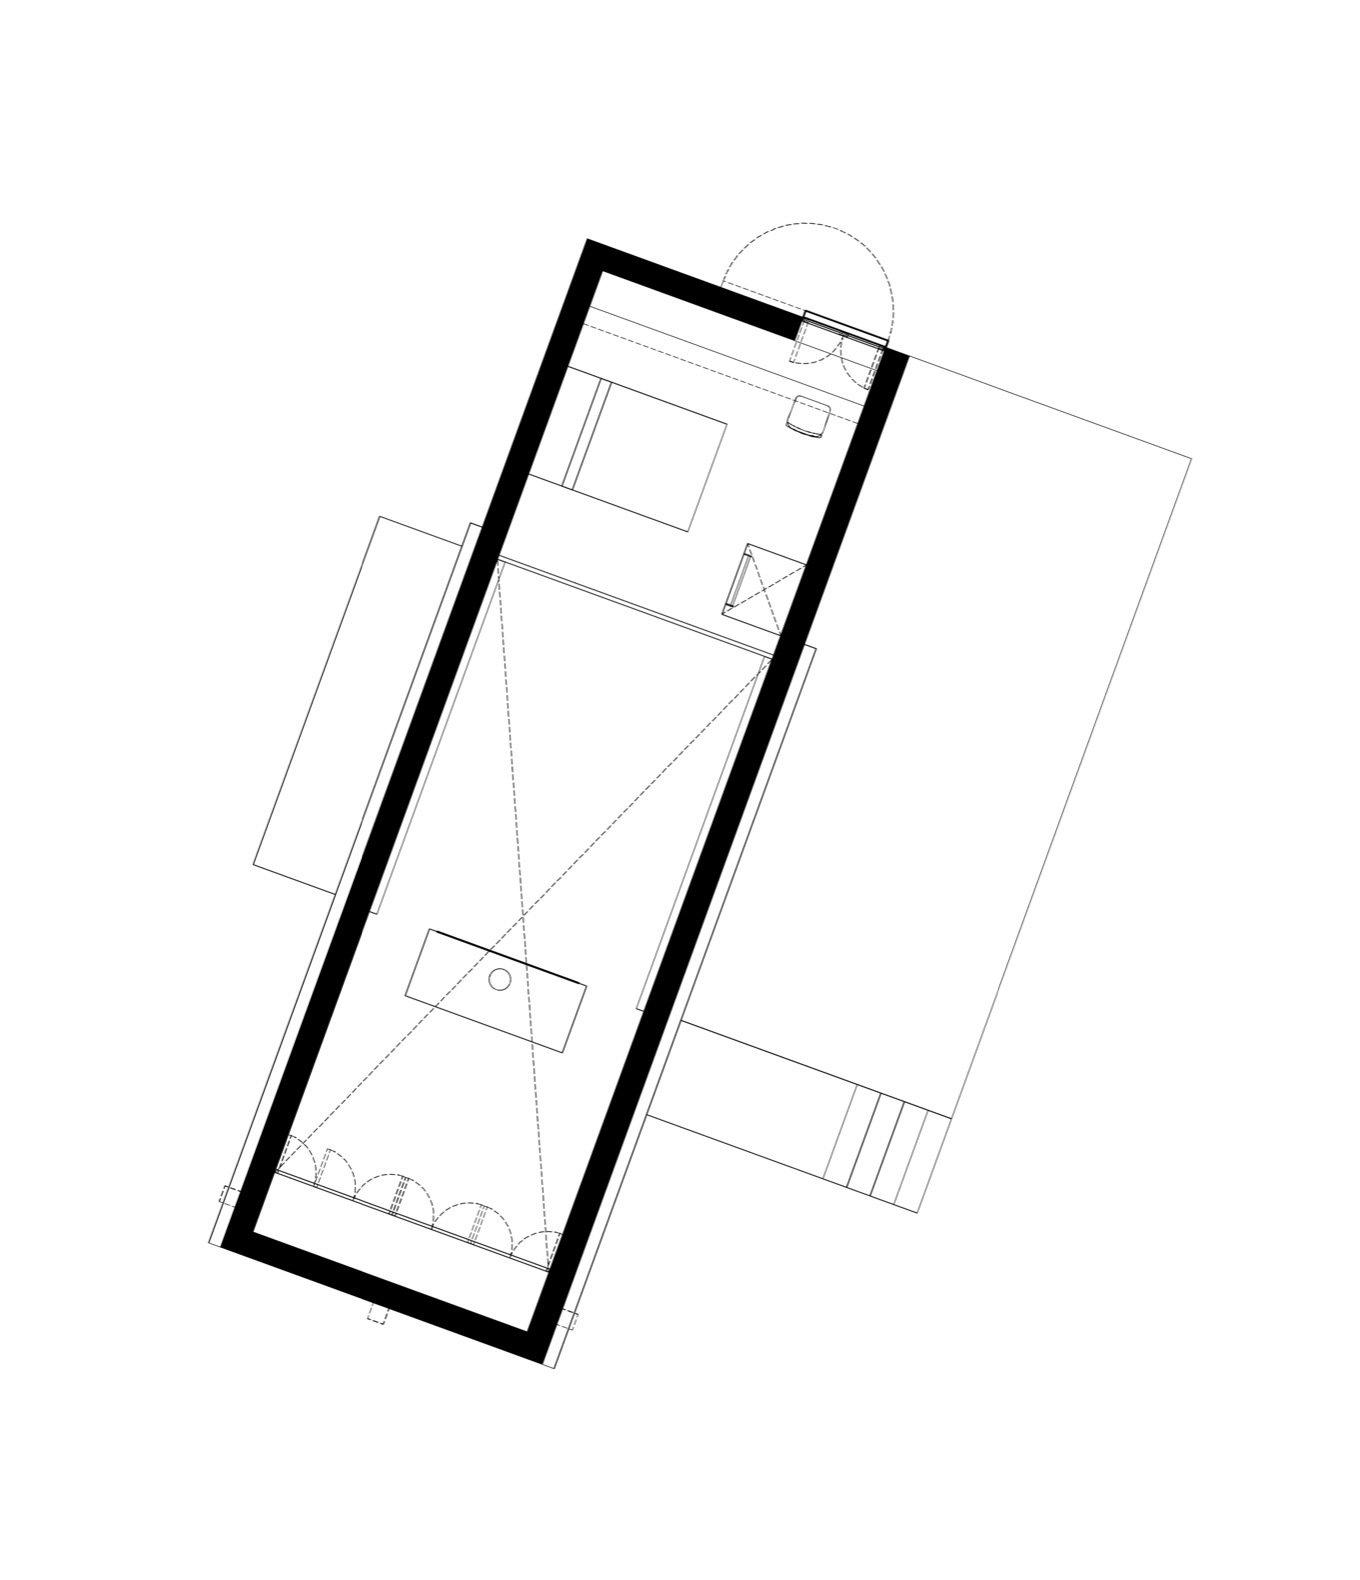 Aculco House upper floor plan